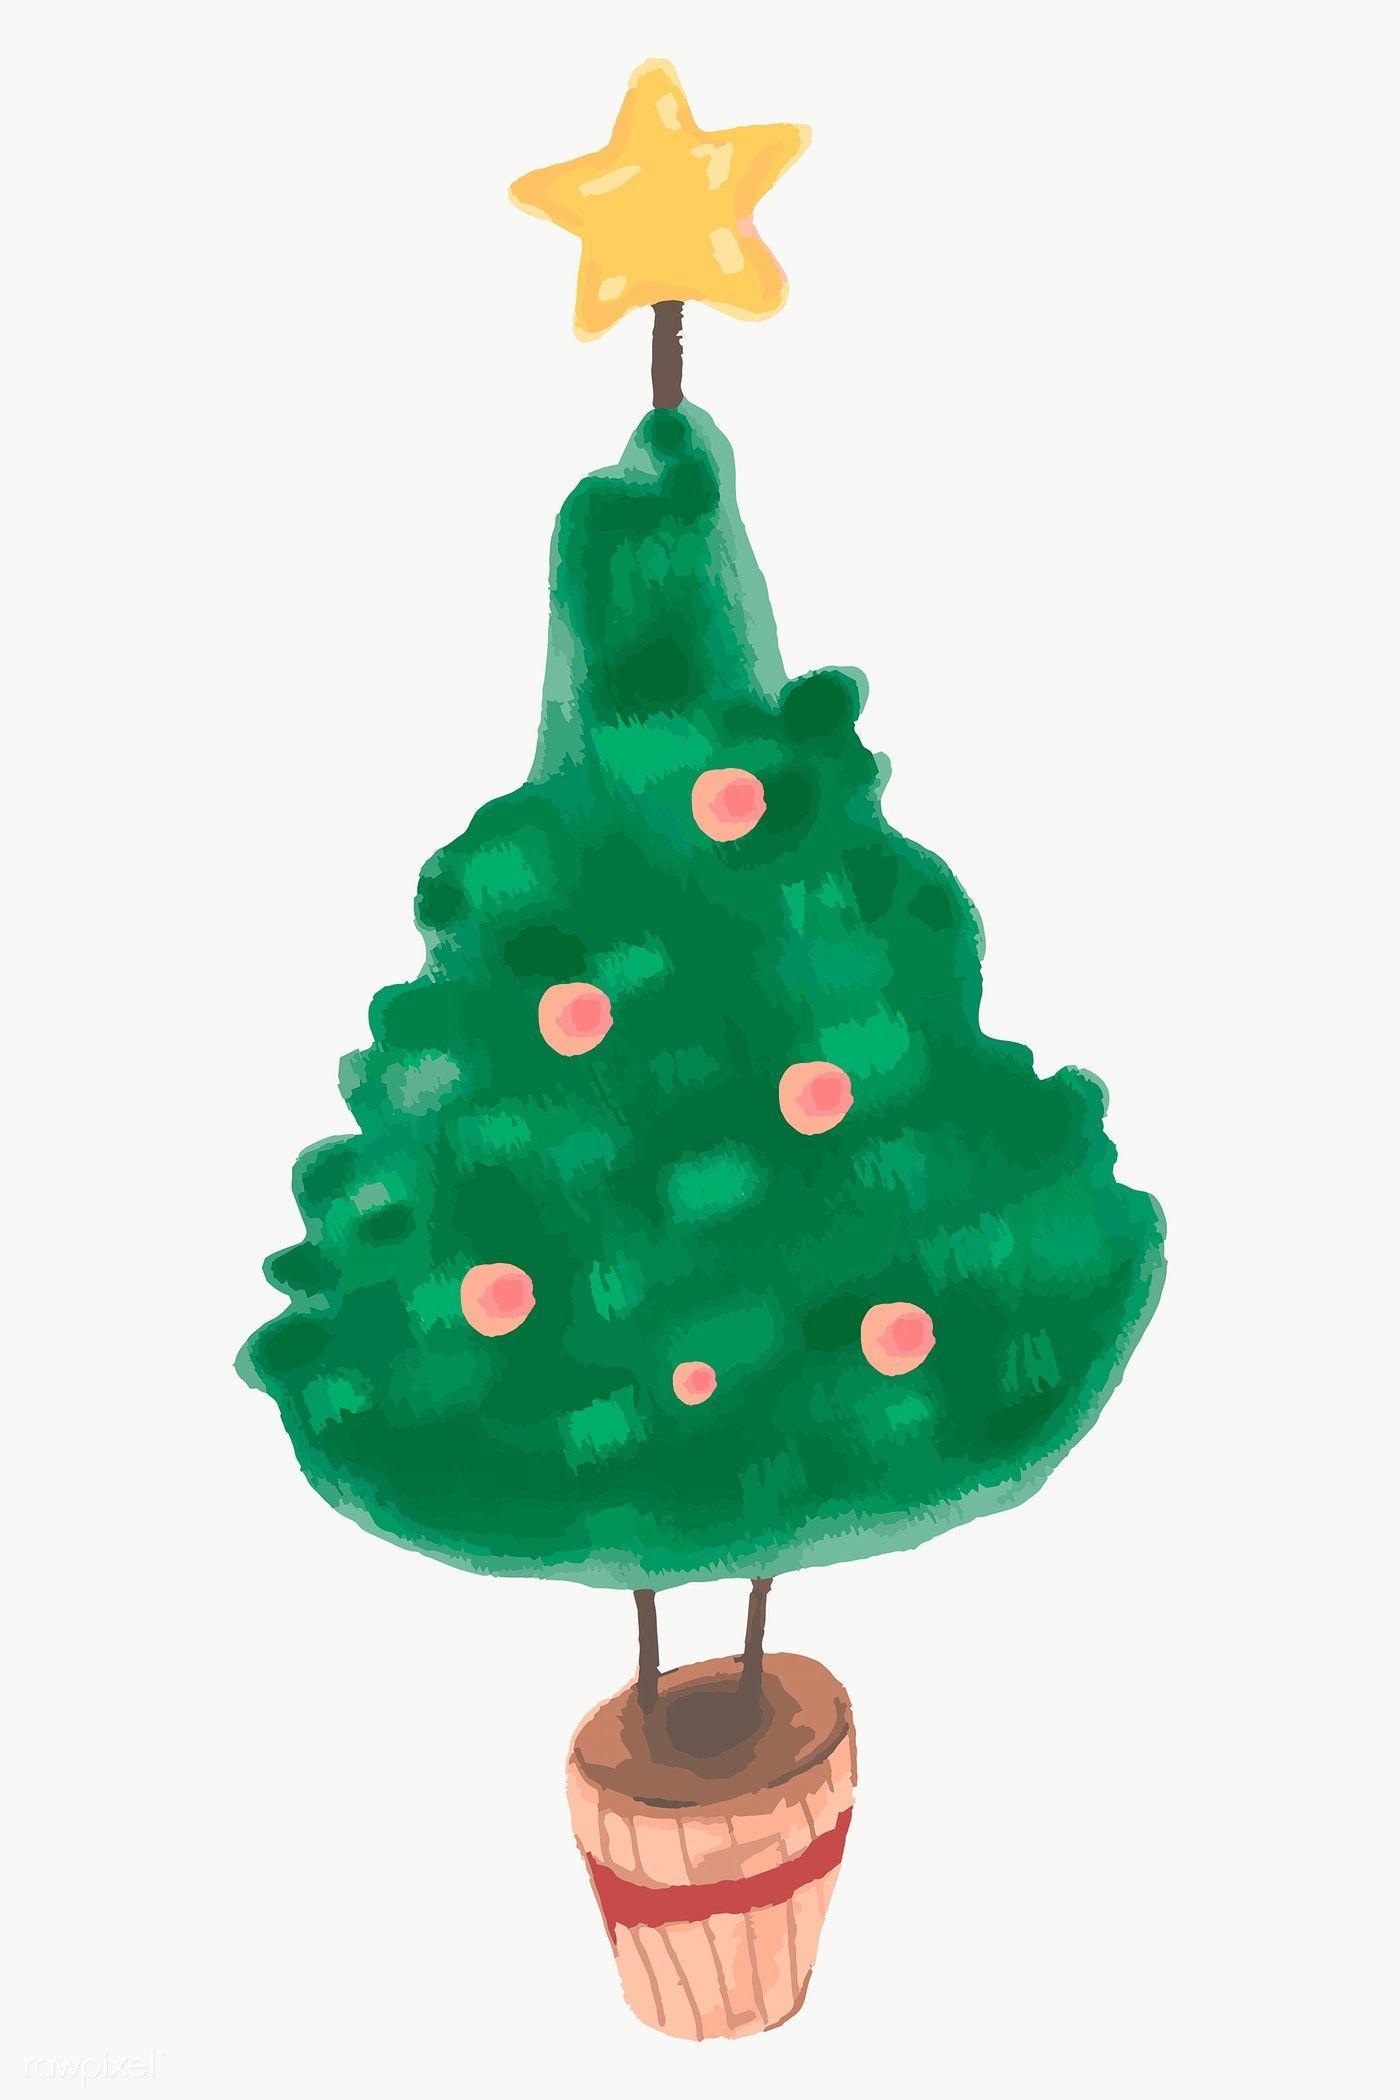 Download Premium Png Of Cute Christmas Tree Element Transparent Png 1231095 Cute Christmas Tree Christmas Wallpaper Christmas Tree